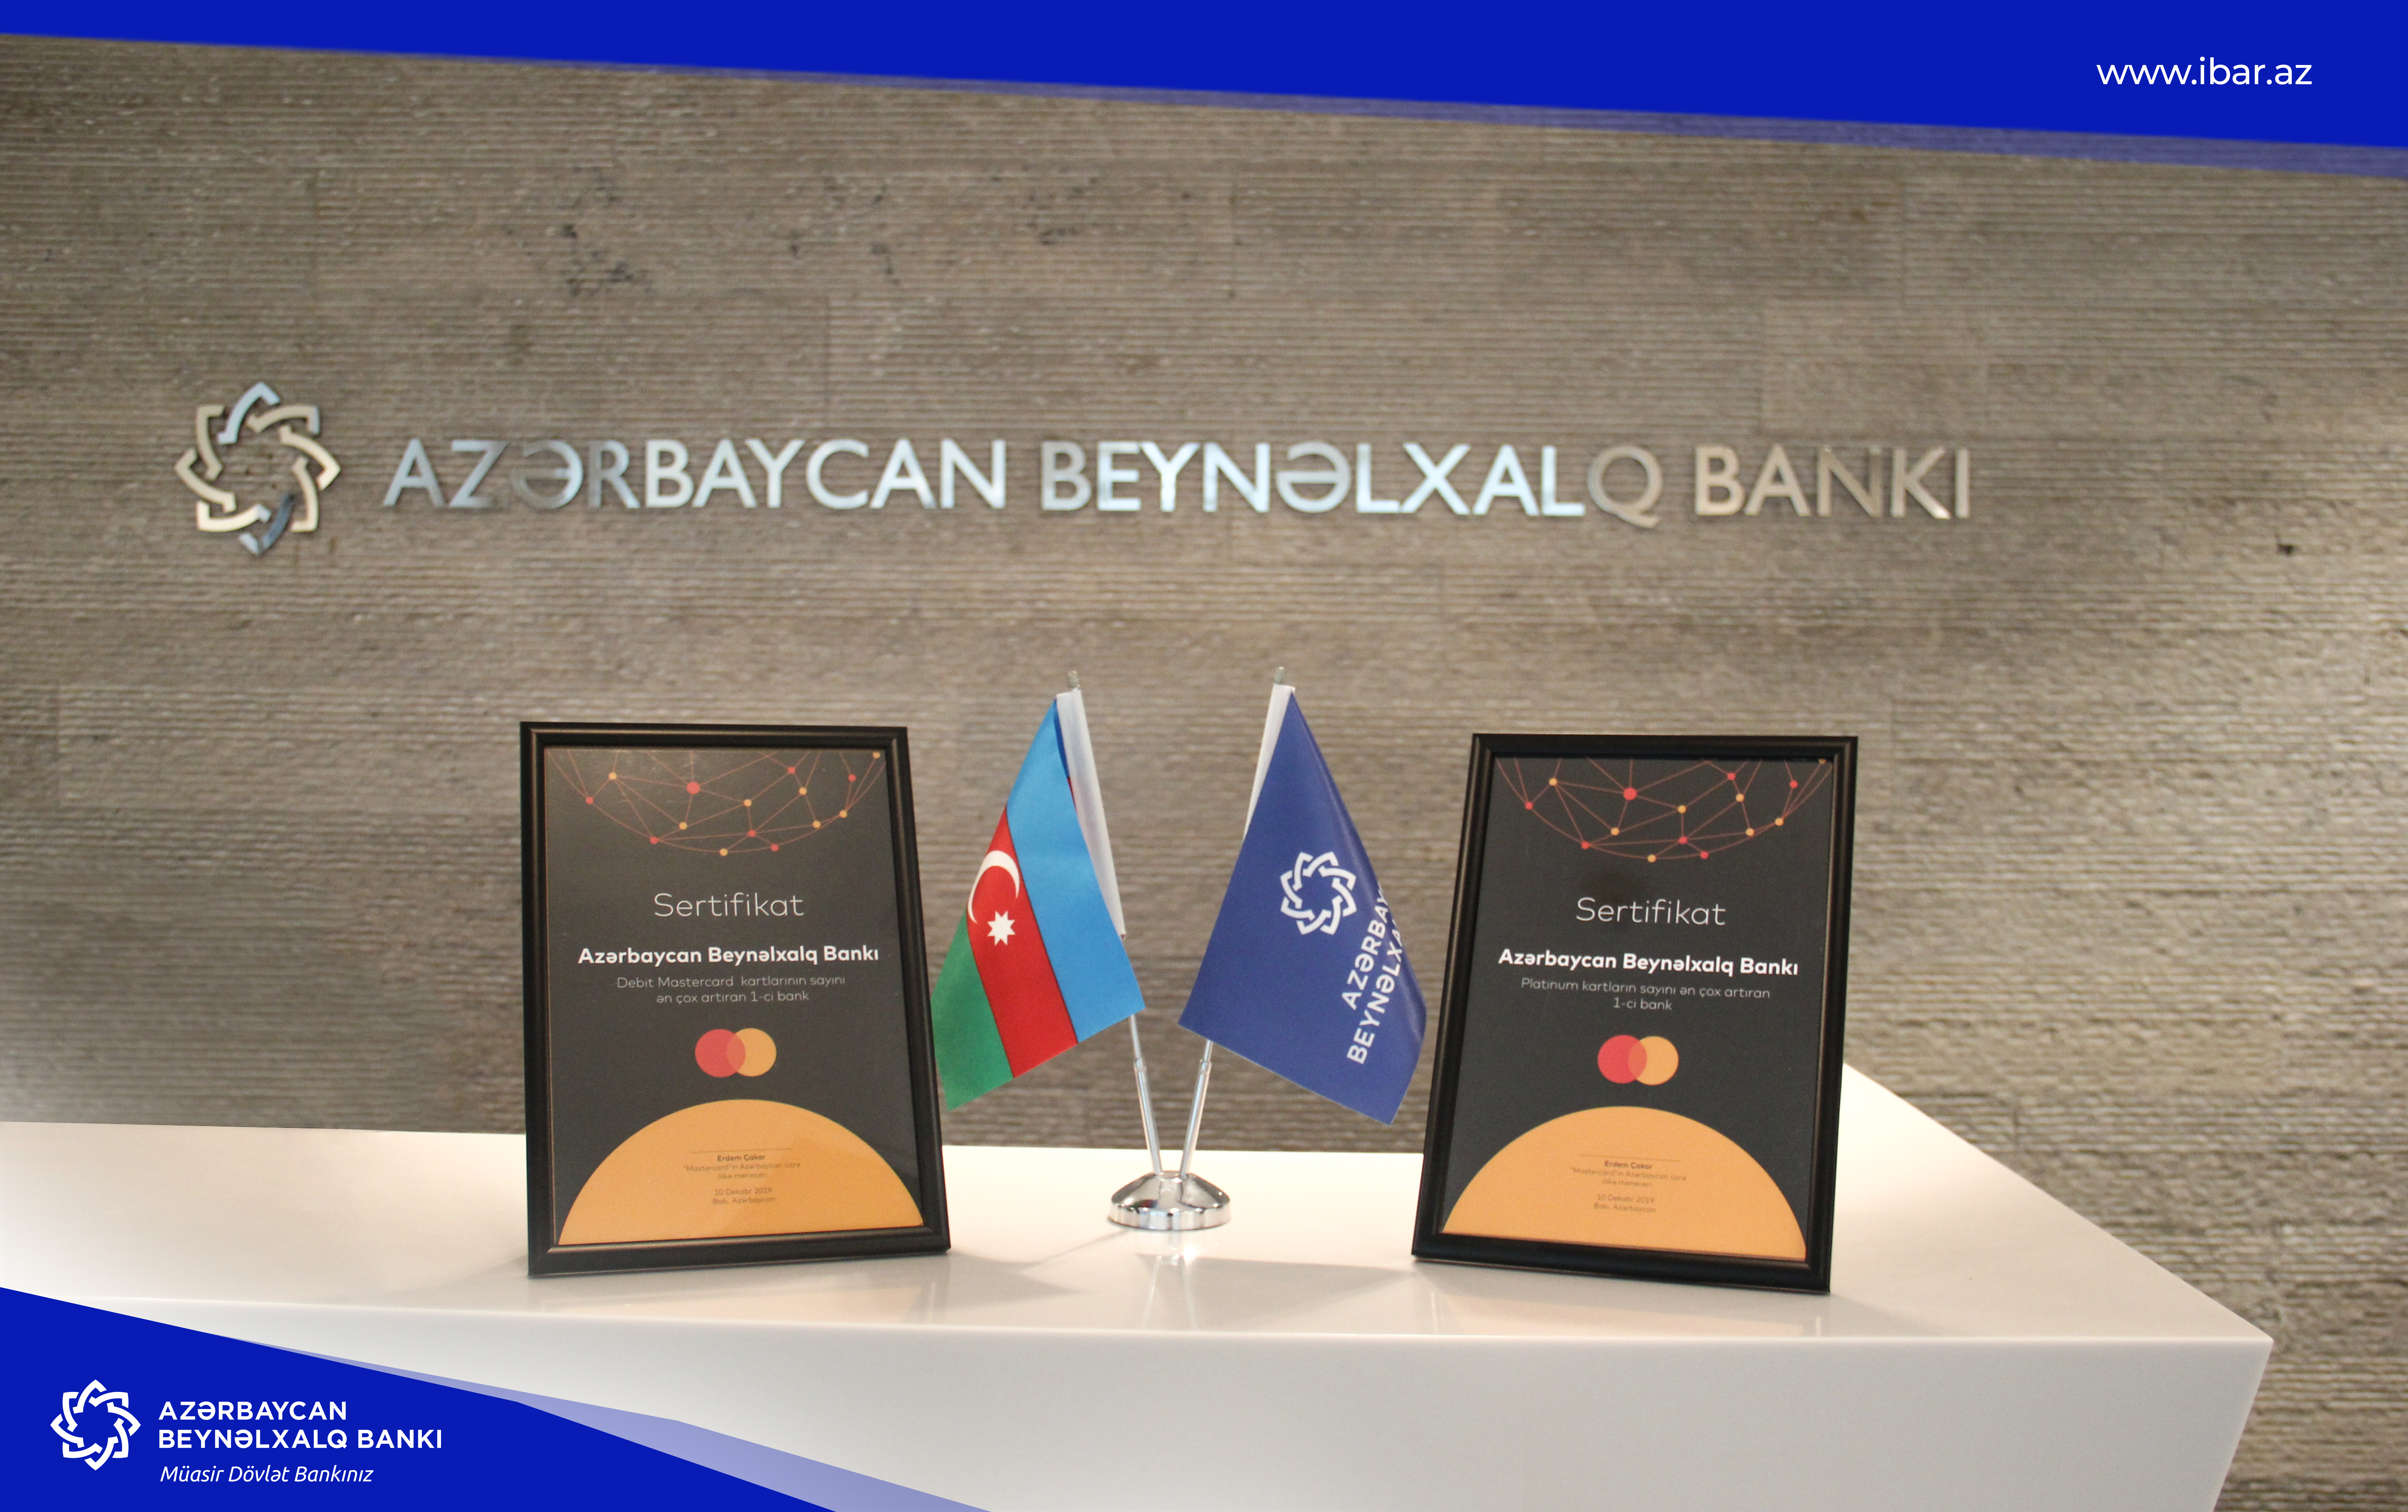 MasterCard вручило Международному Банку Азербайджана две награды